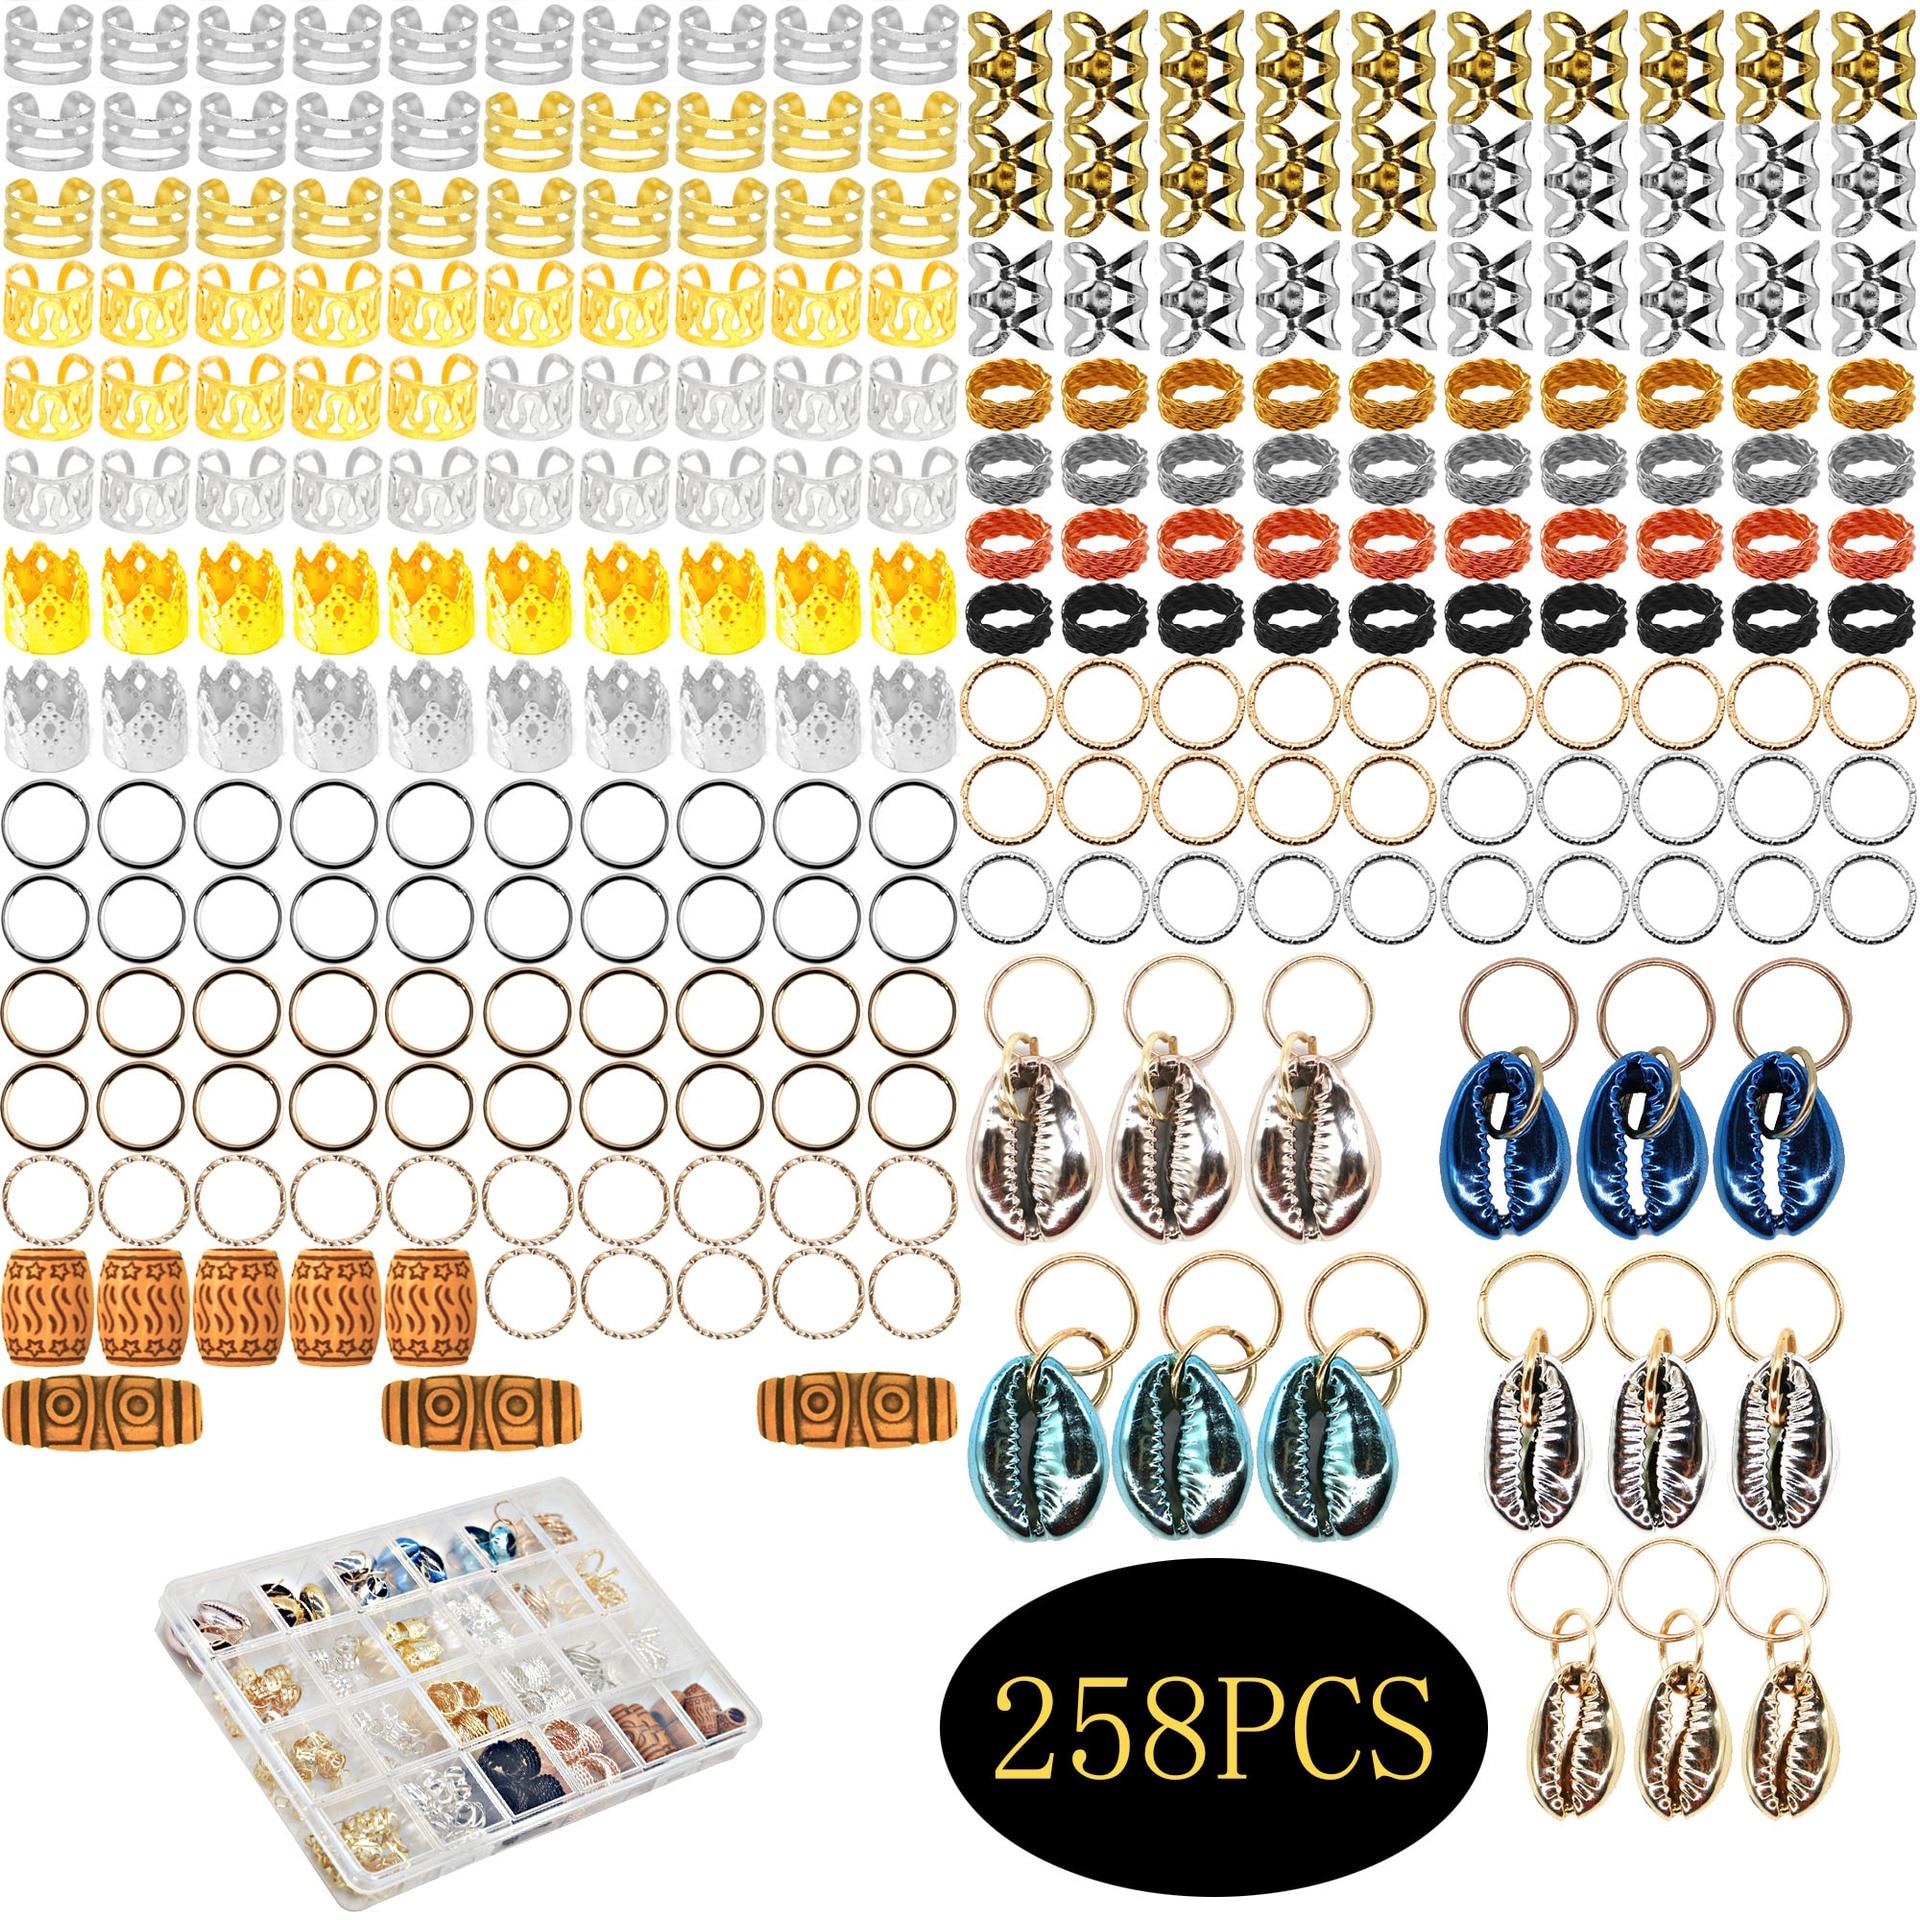 258pcs/Lot shells Hair Rings For Black Women Micro Hair Beads Braid Jewelry Spiral Metal Microlink Tube Charms